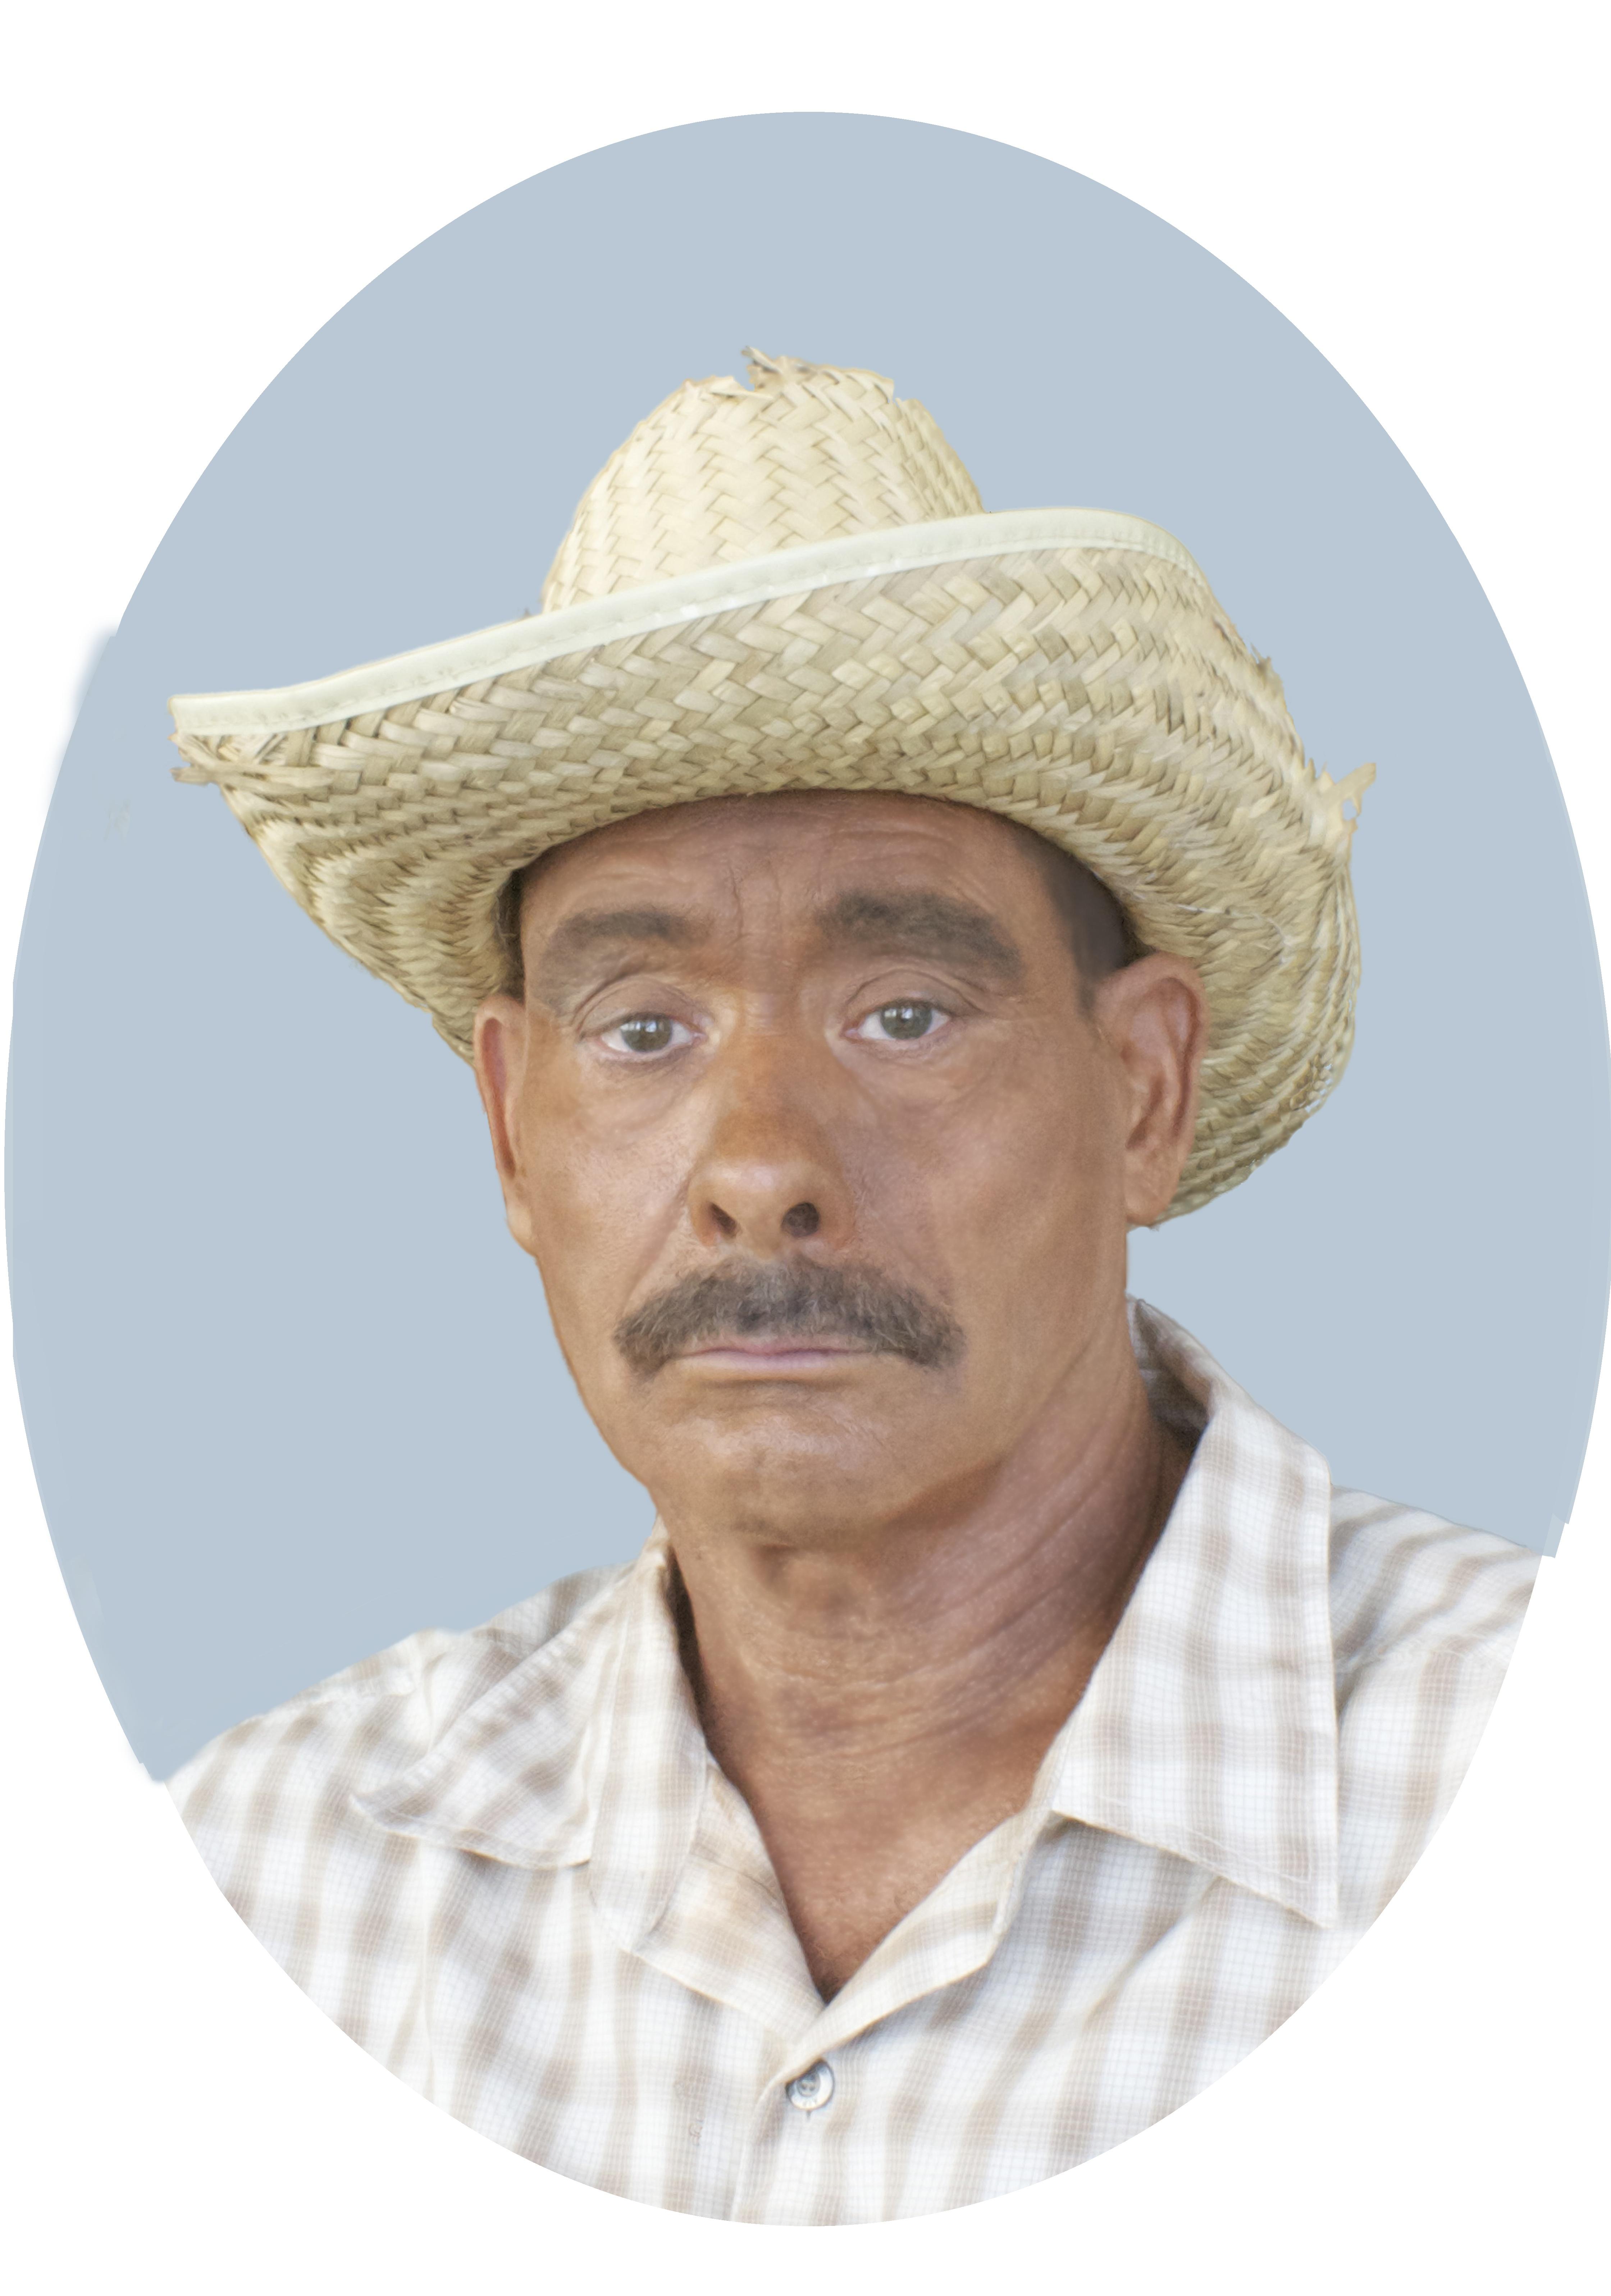 farmer_Fnl11